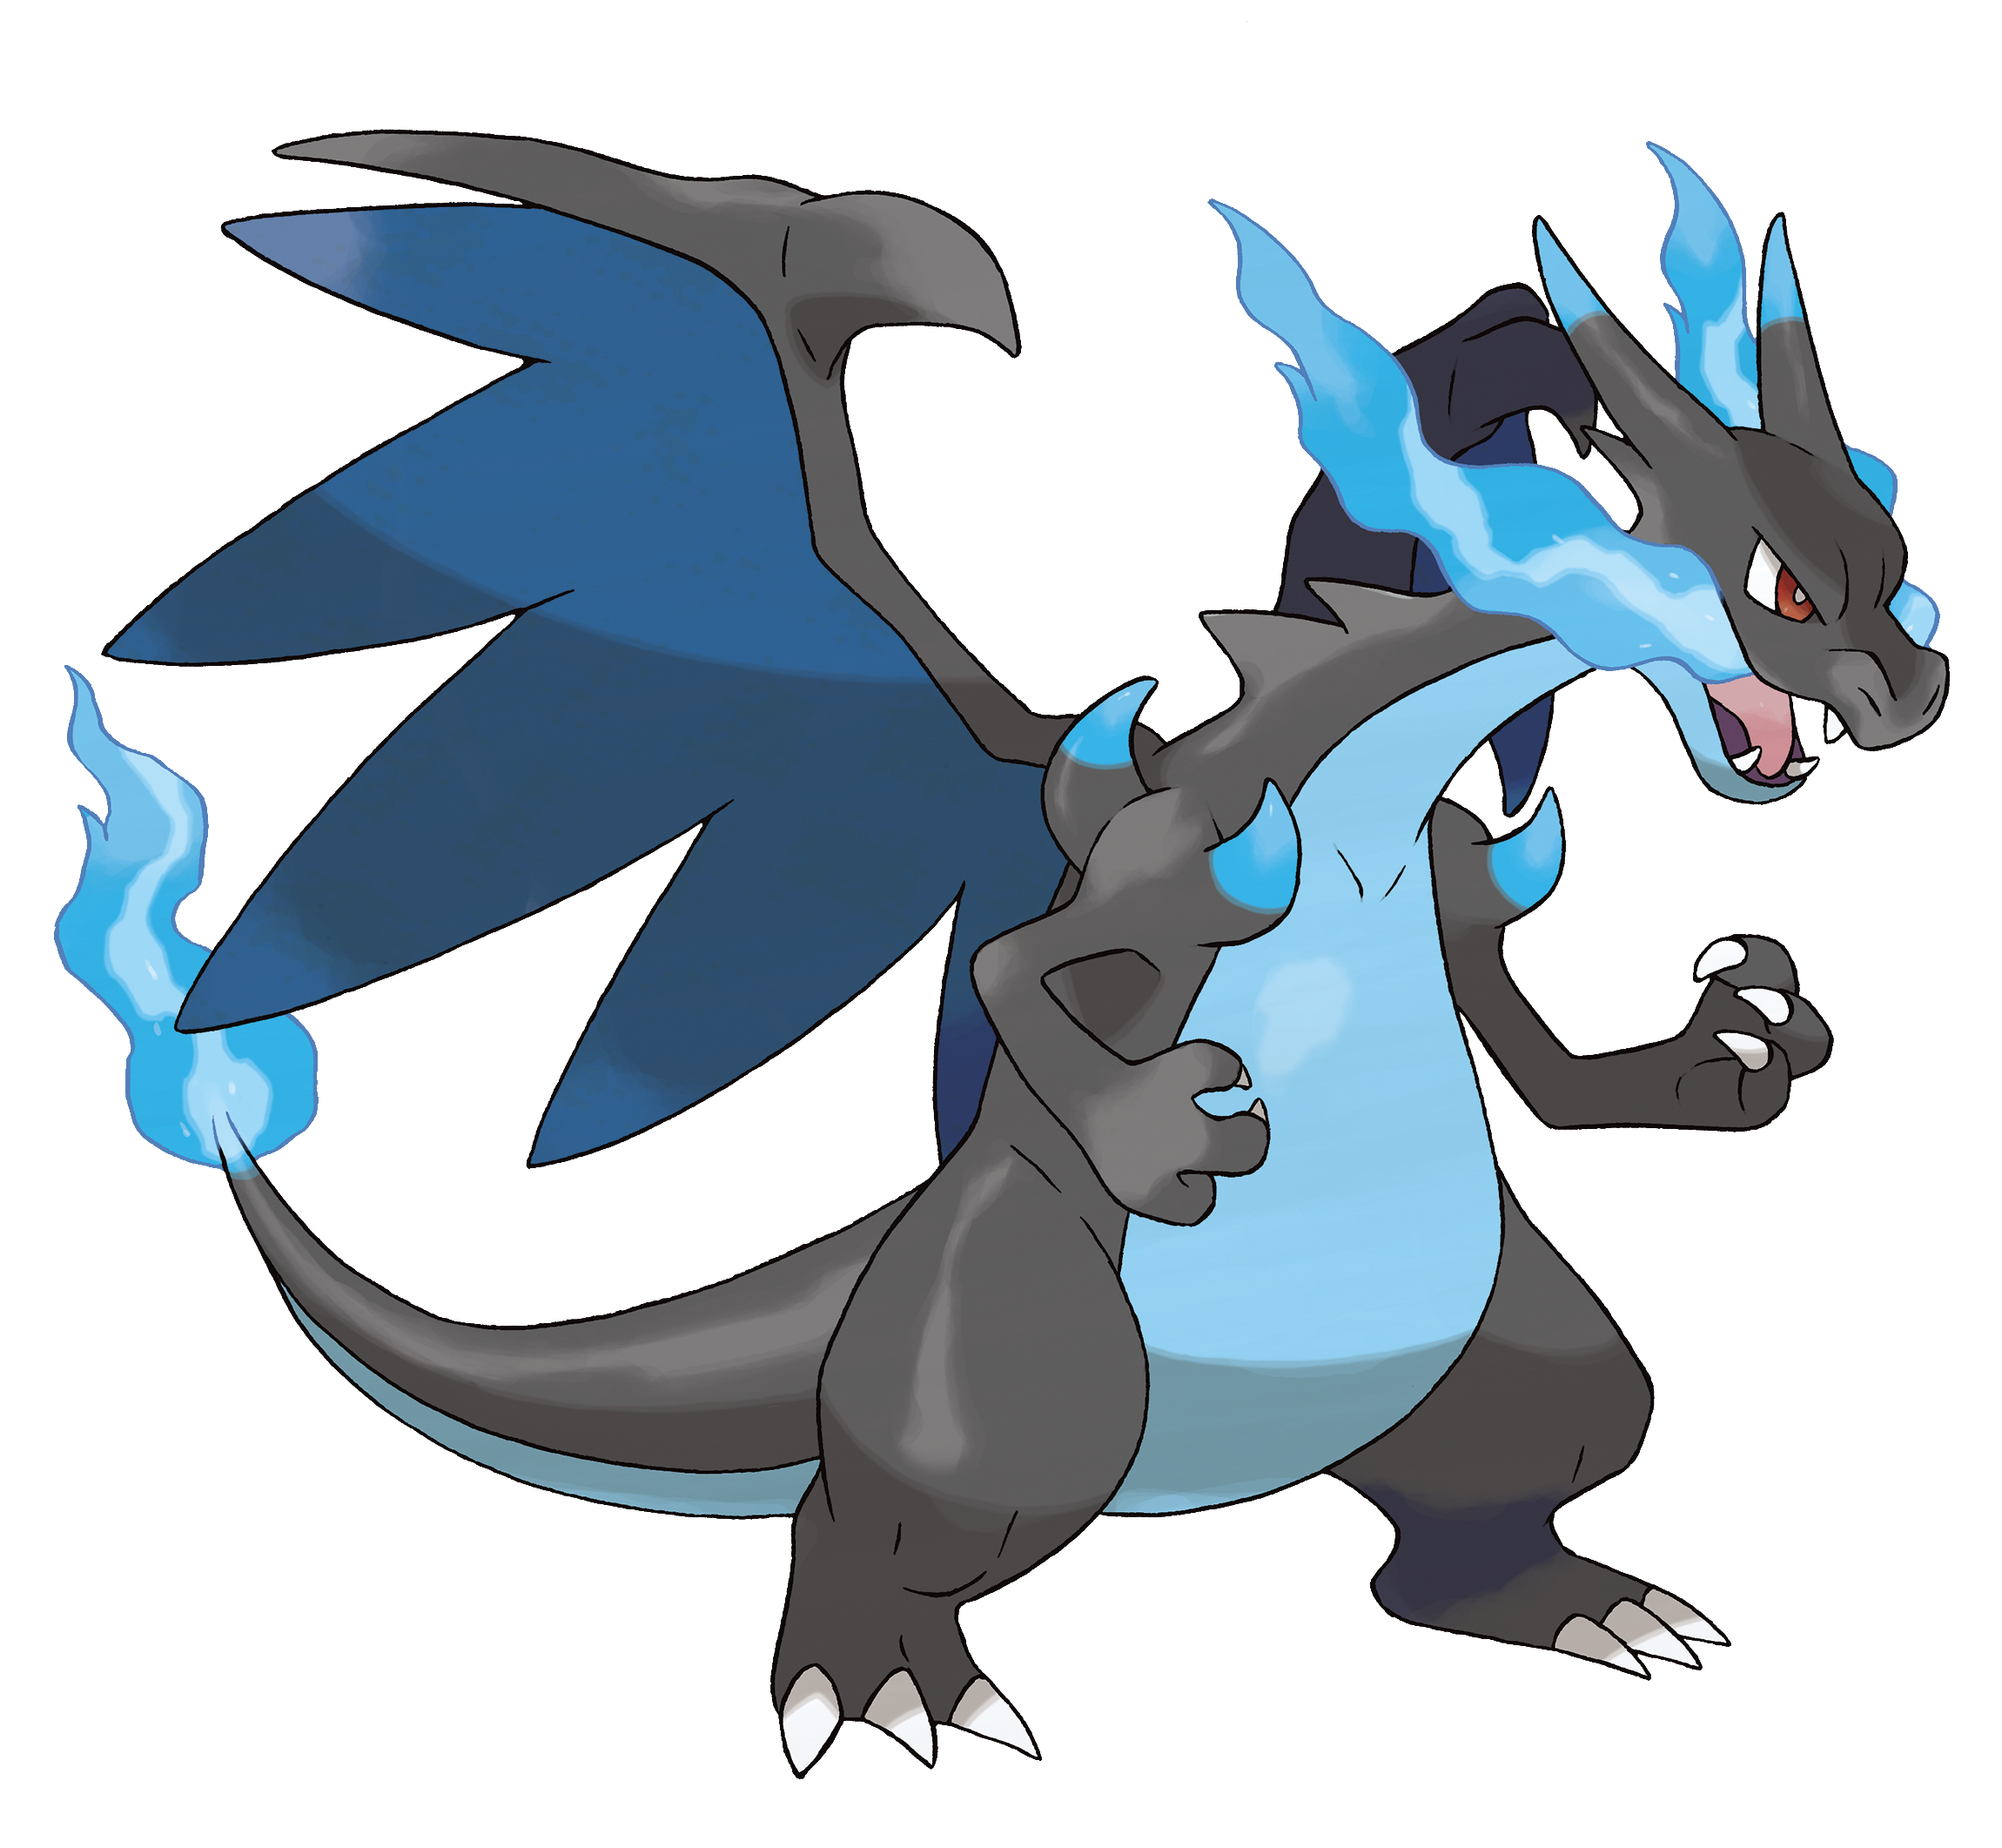 Diferencias entre Pokémon x y Pokémon y Mega-Charizard_X